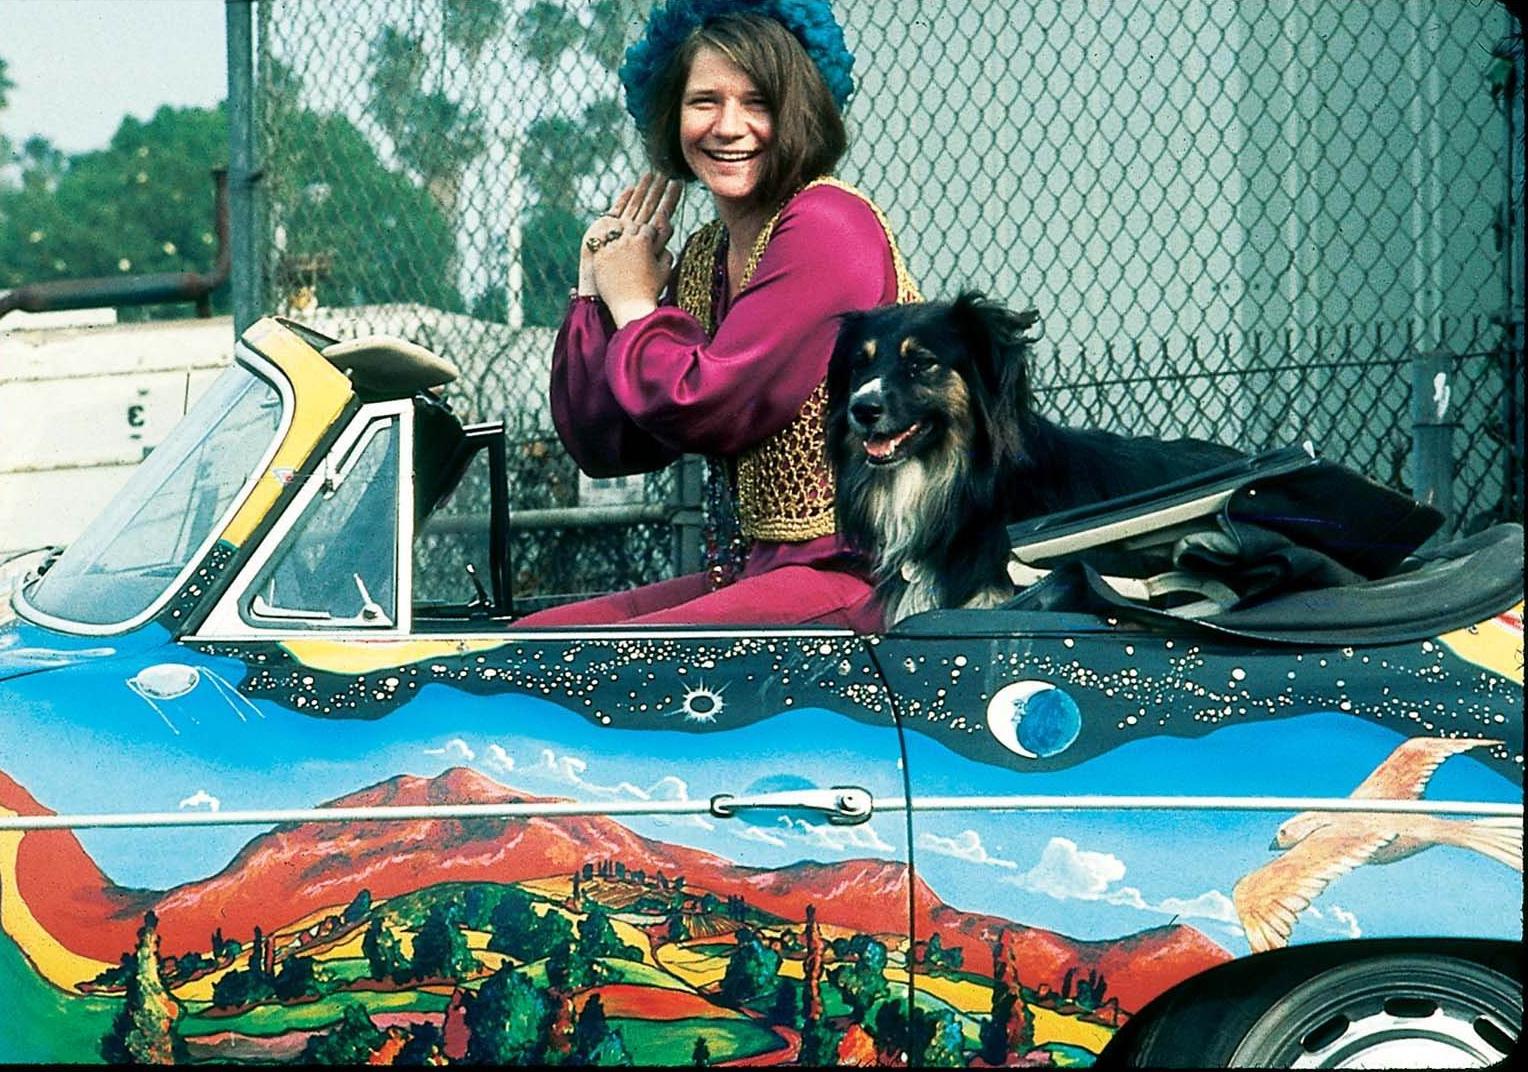 Clasp garage rockstars 39 garage janis joplin psychedelic for Janis joplin mercedes benz